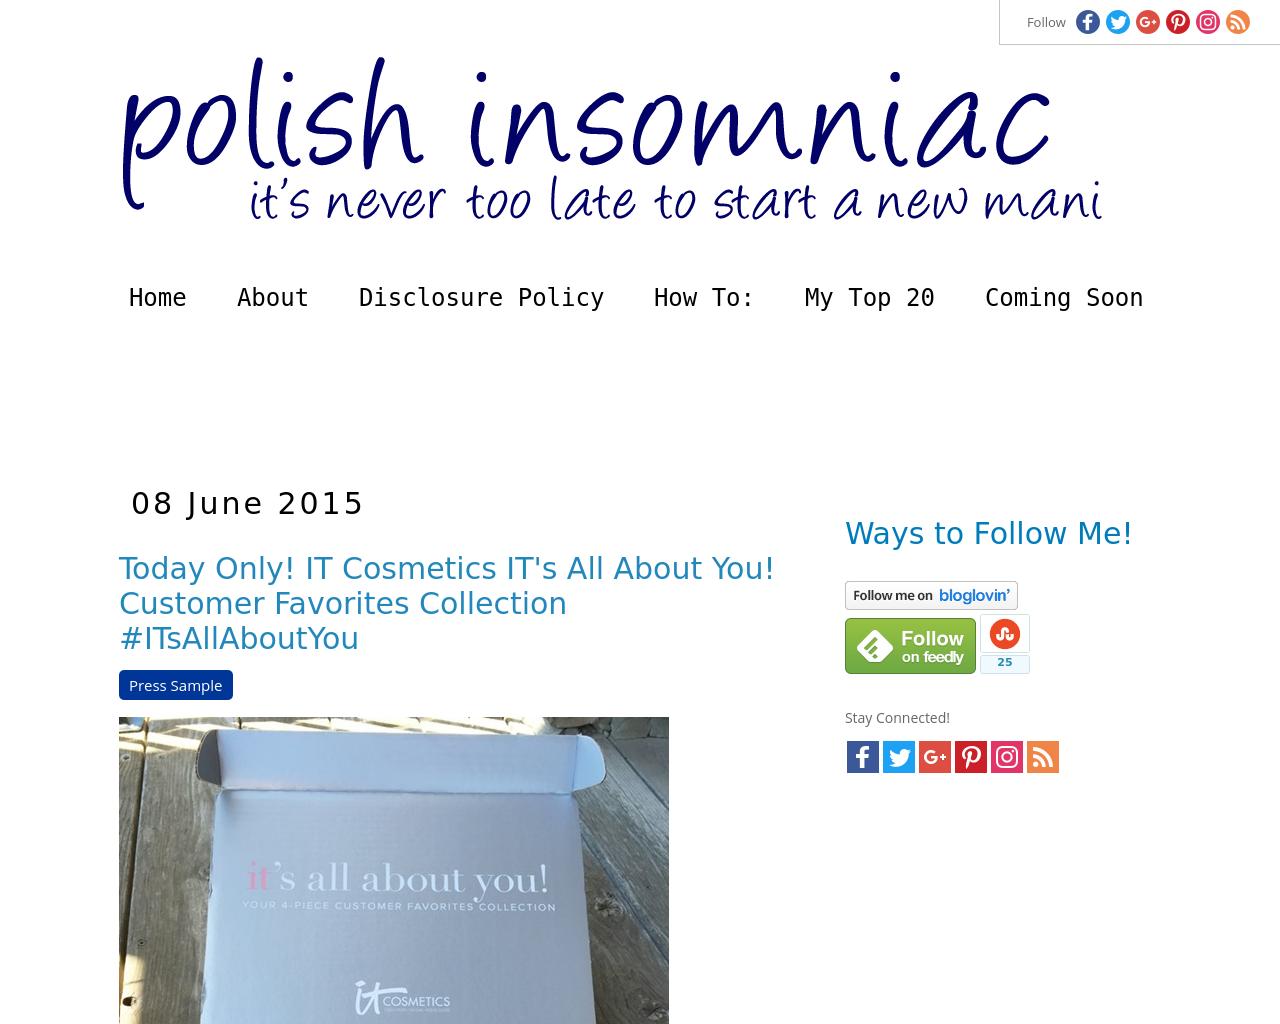 Polish-Insomniac-Advertising-Reviews-Pricing